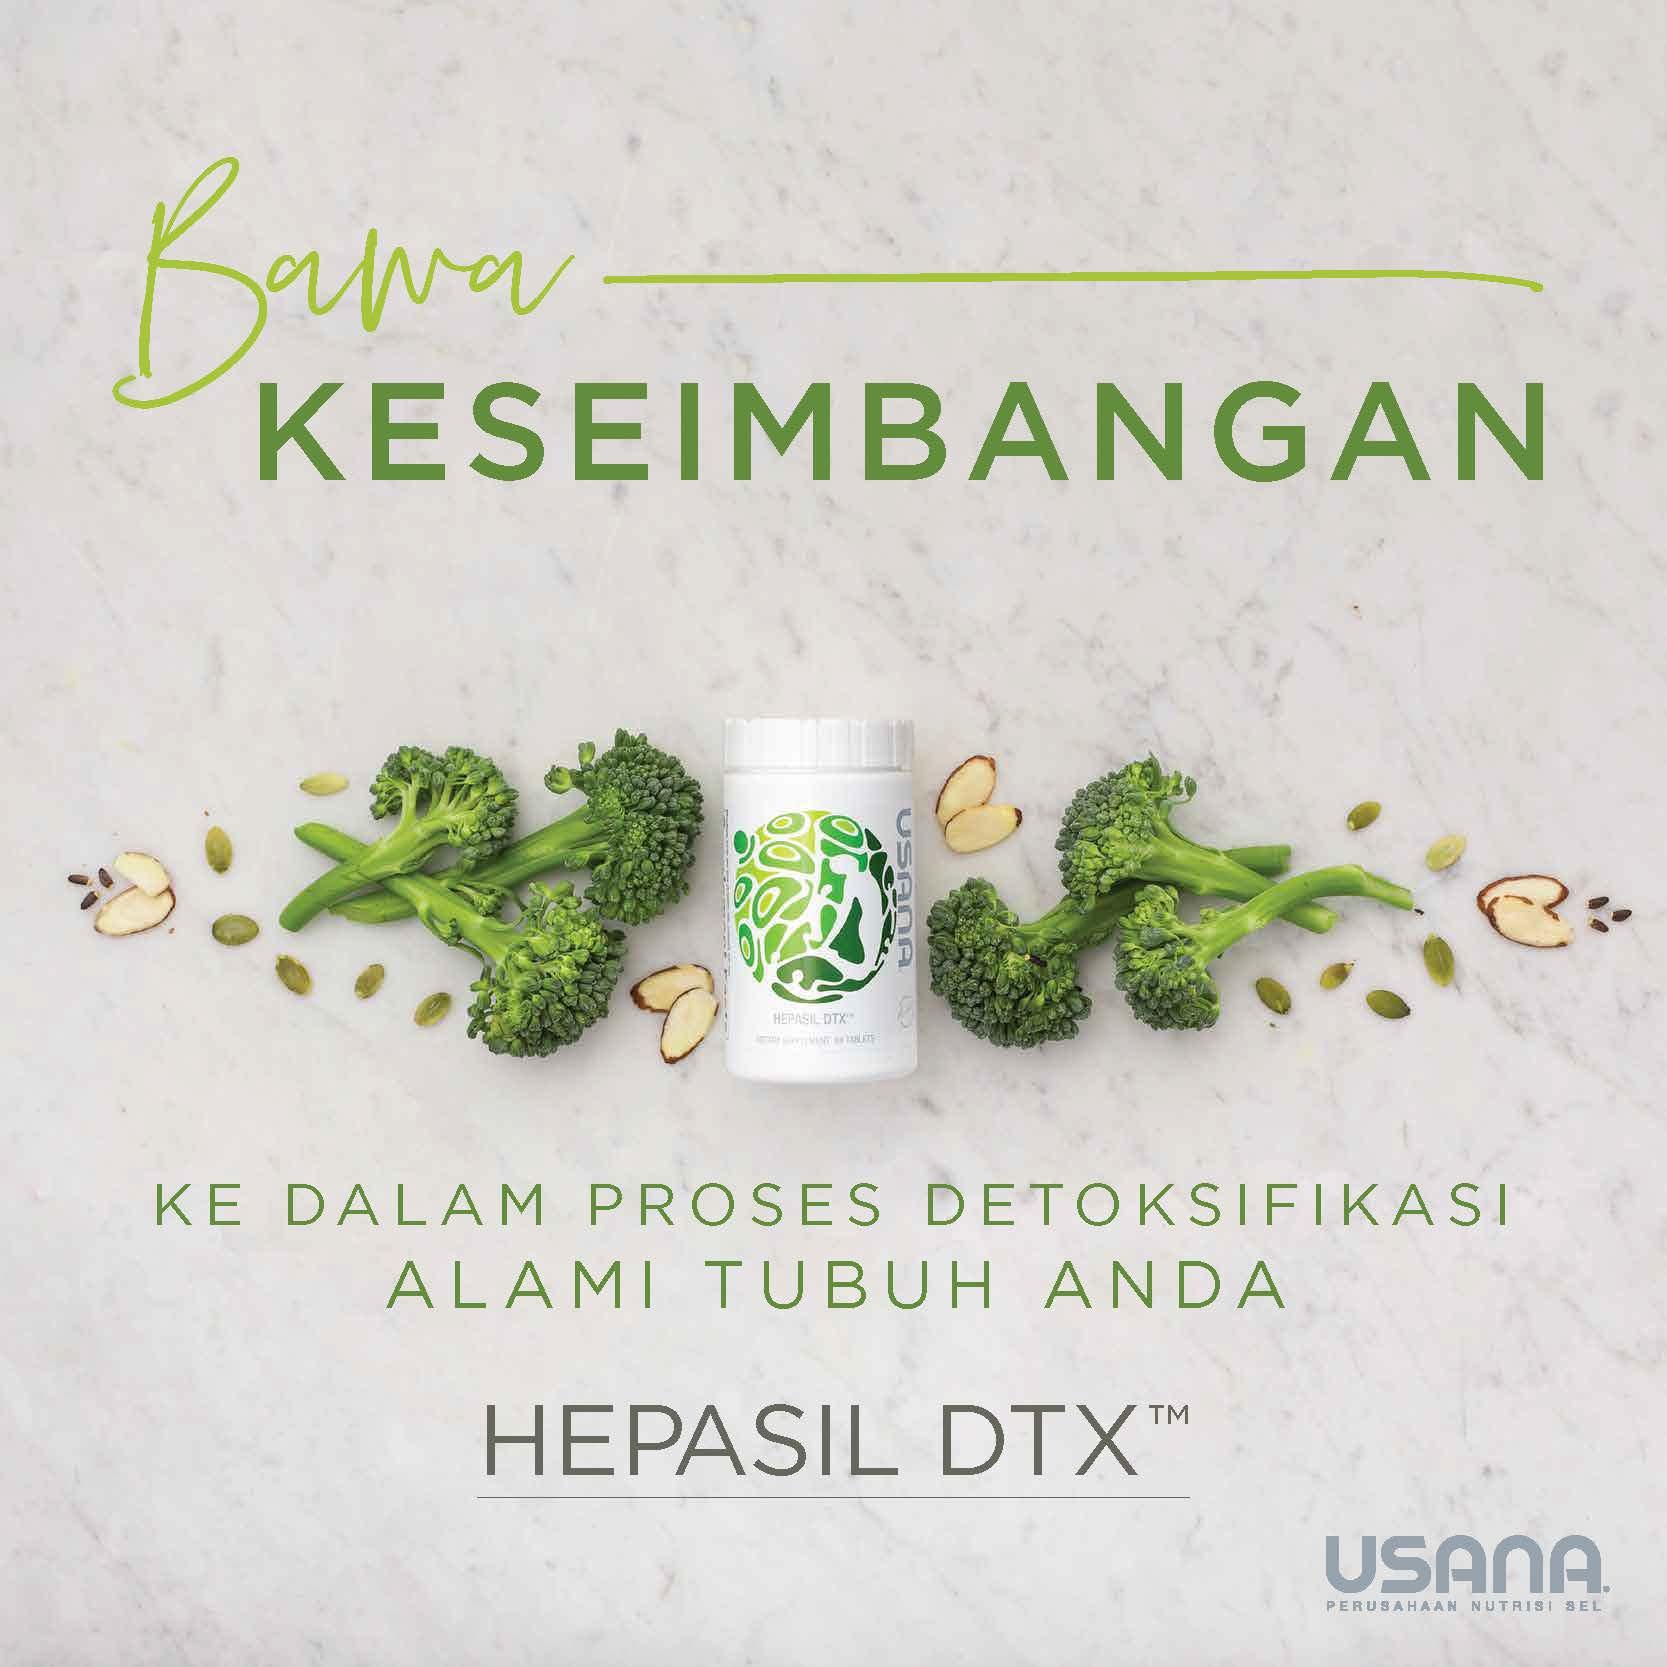 hepasil dtx usana indonesia